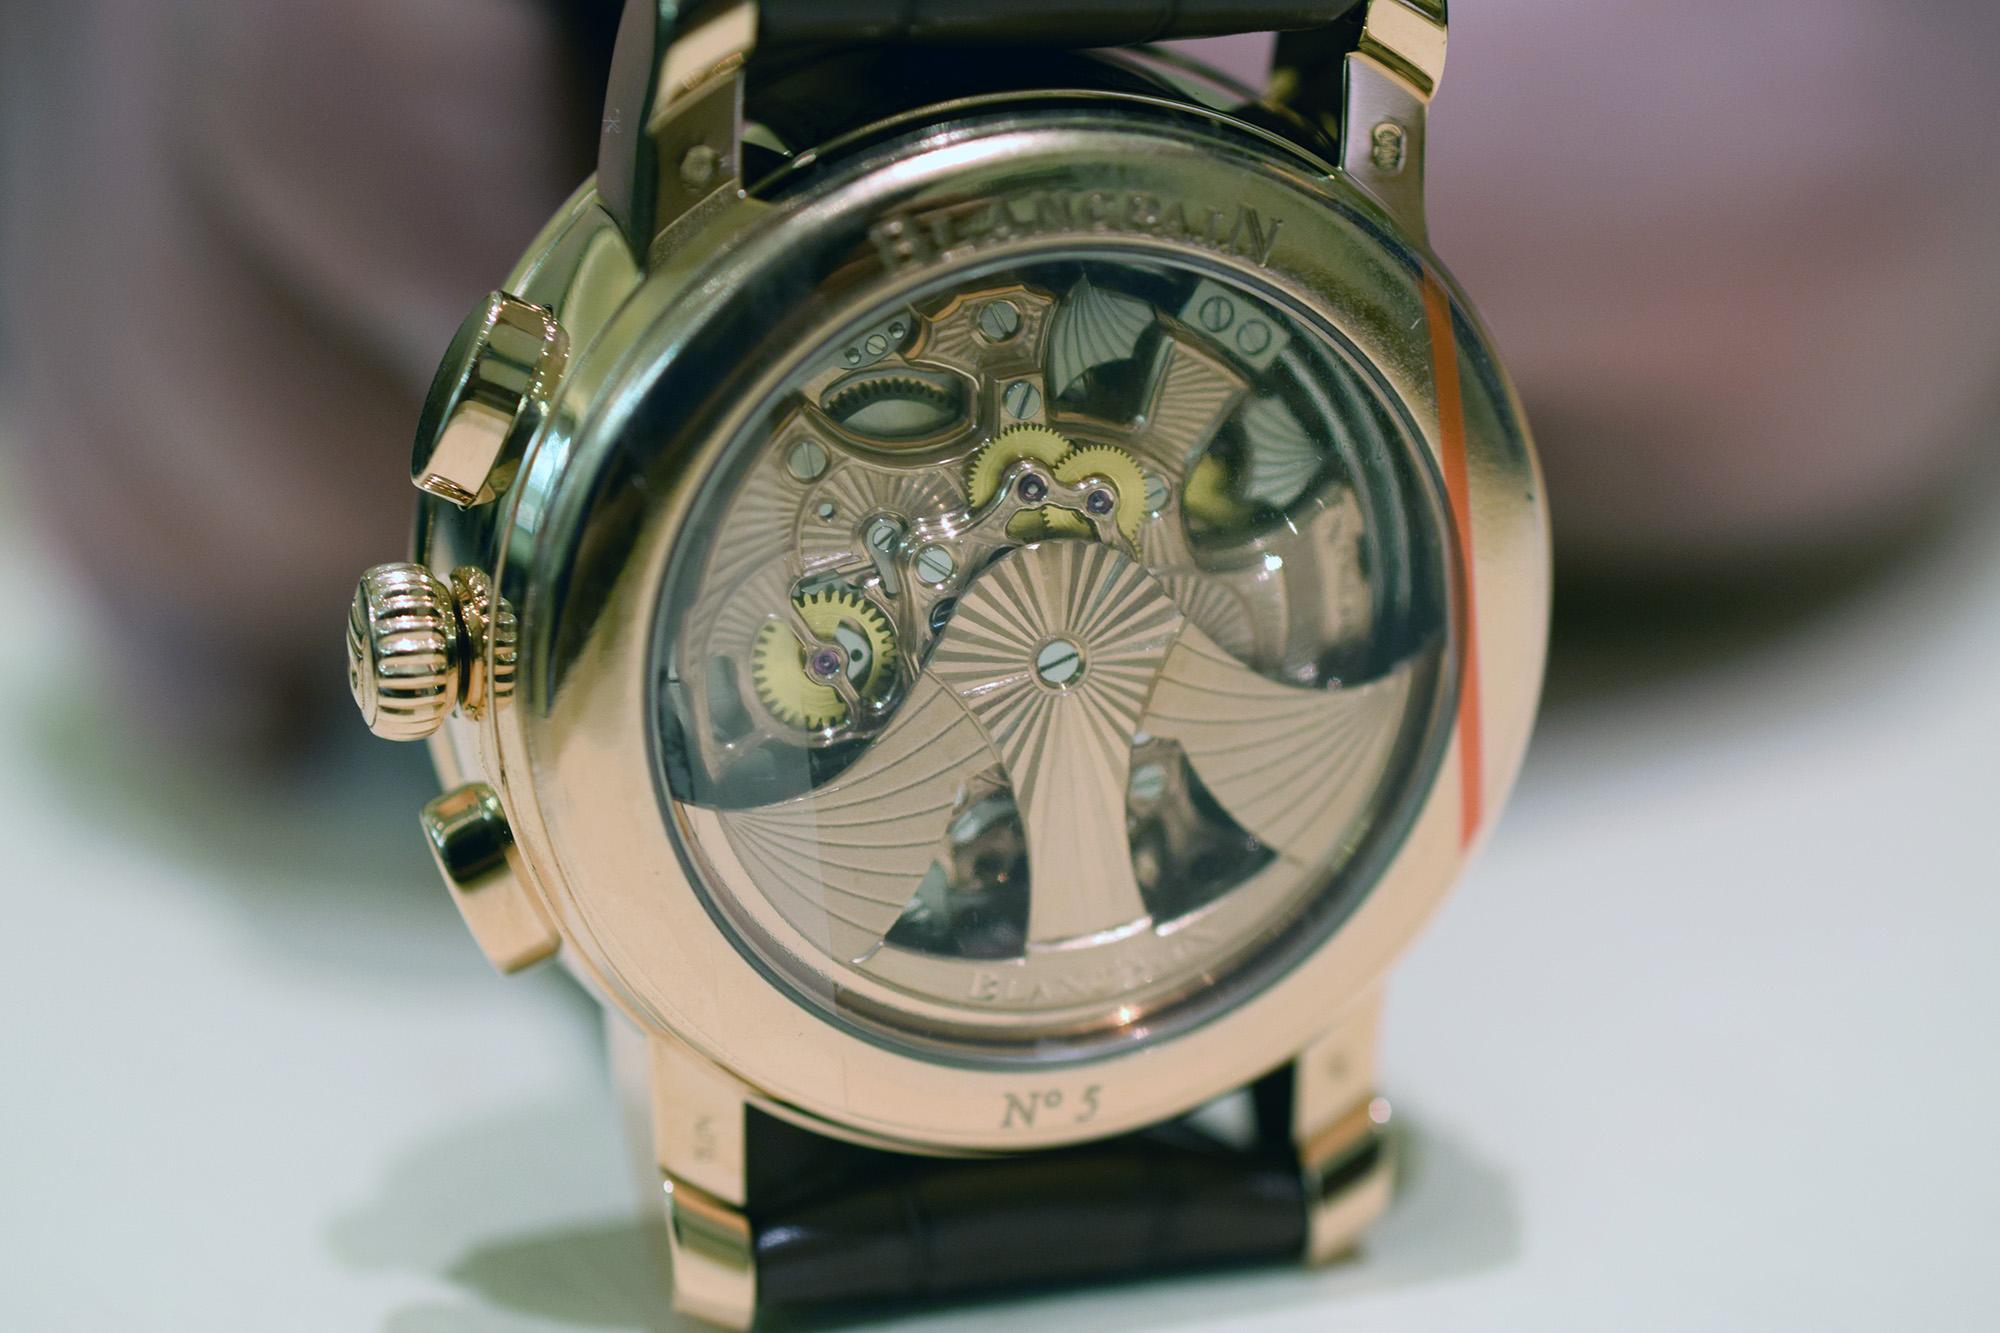 Blancpain Carrousel Répétition Minutes Chronographe Flyback - Caseback